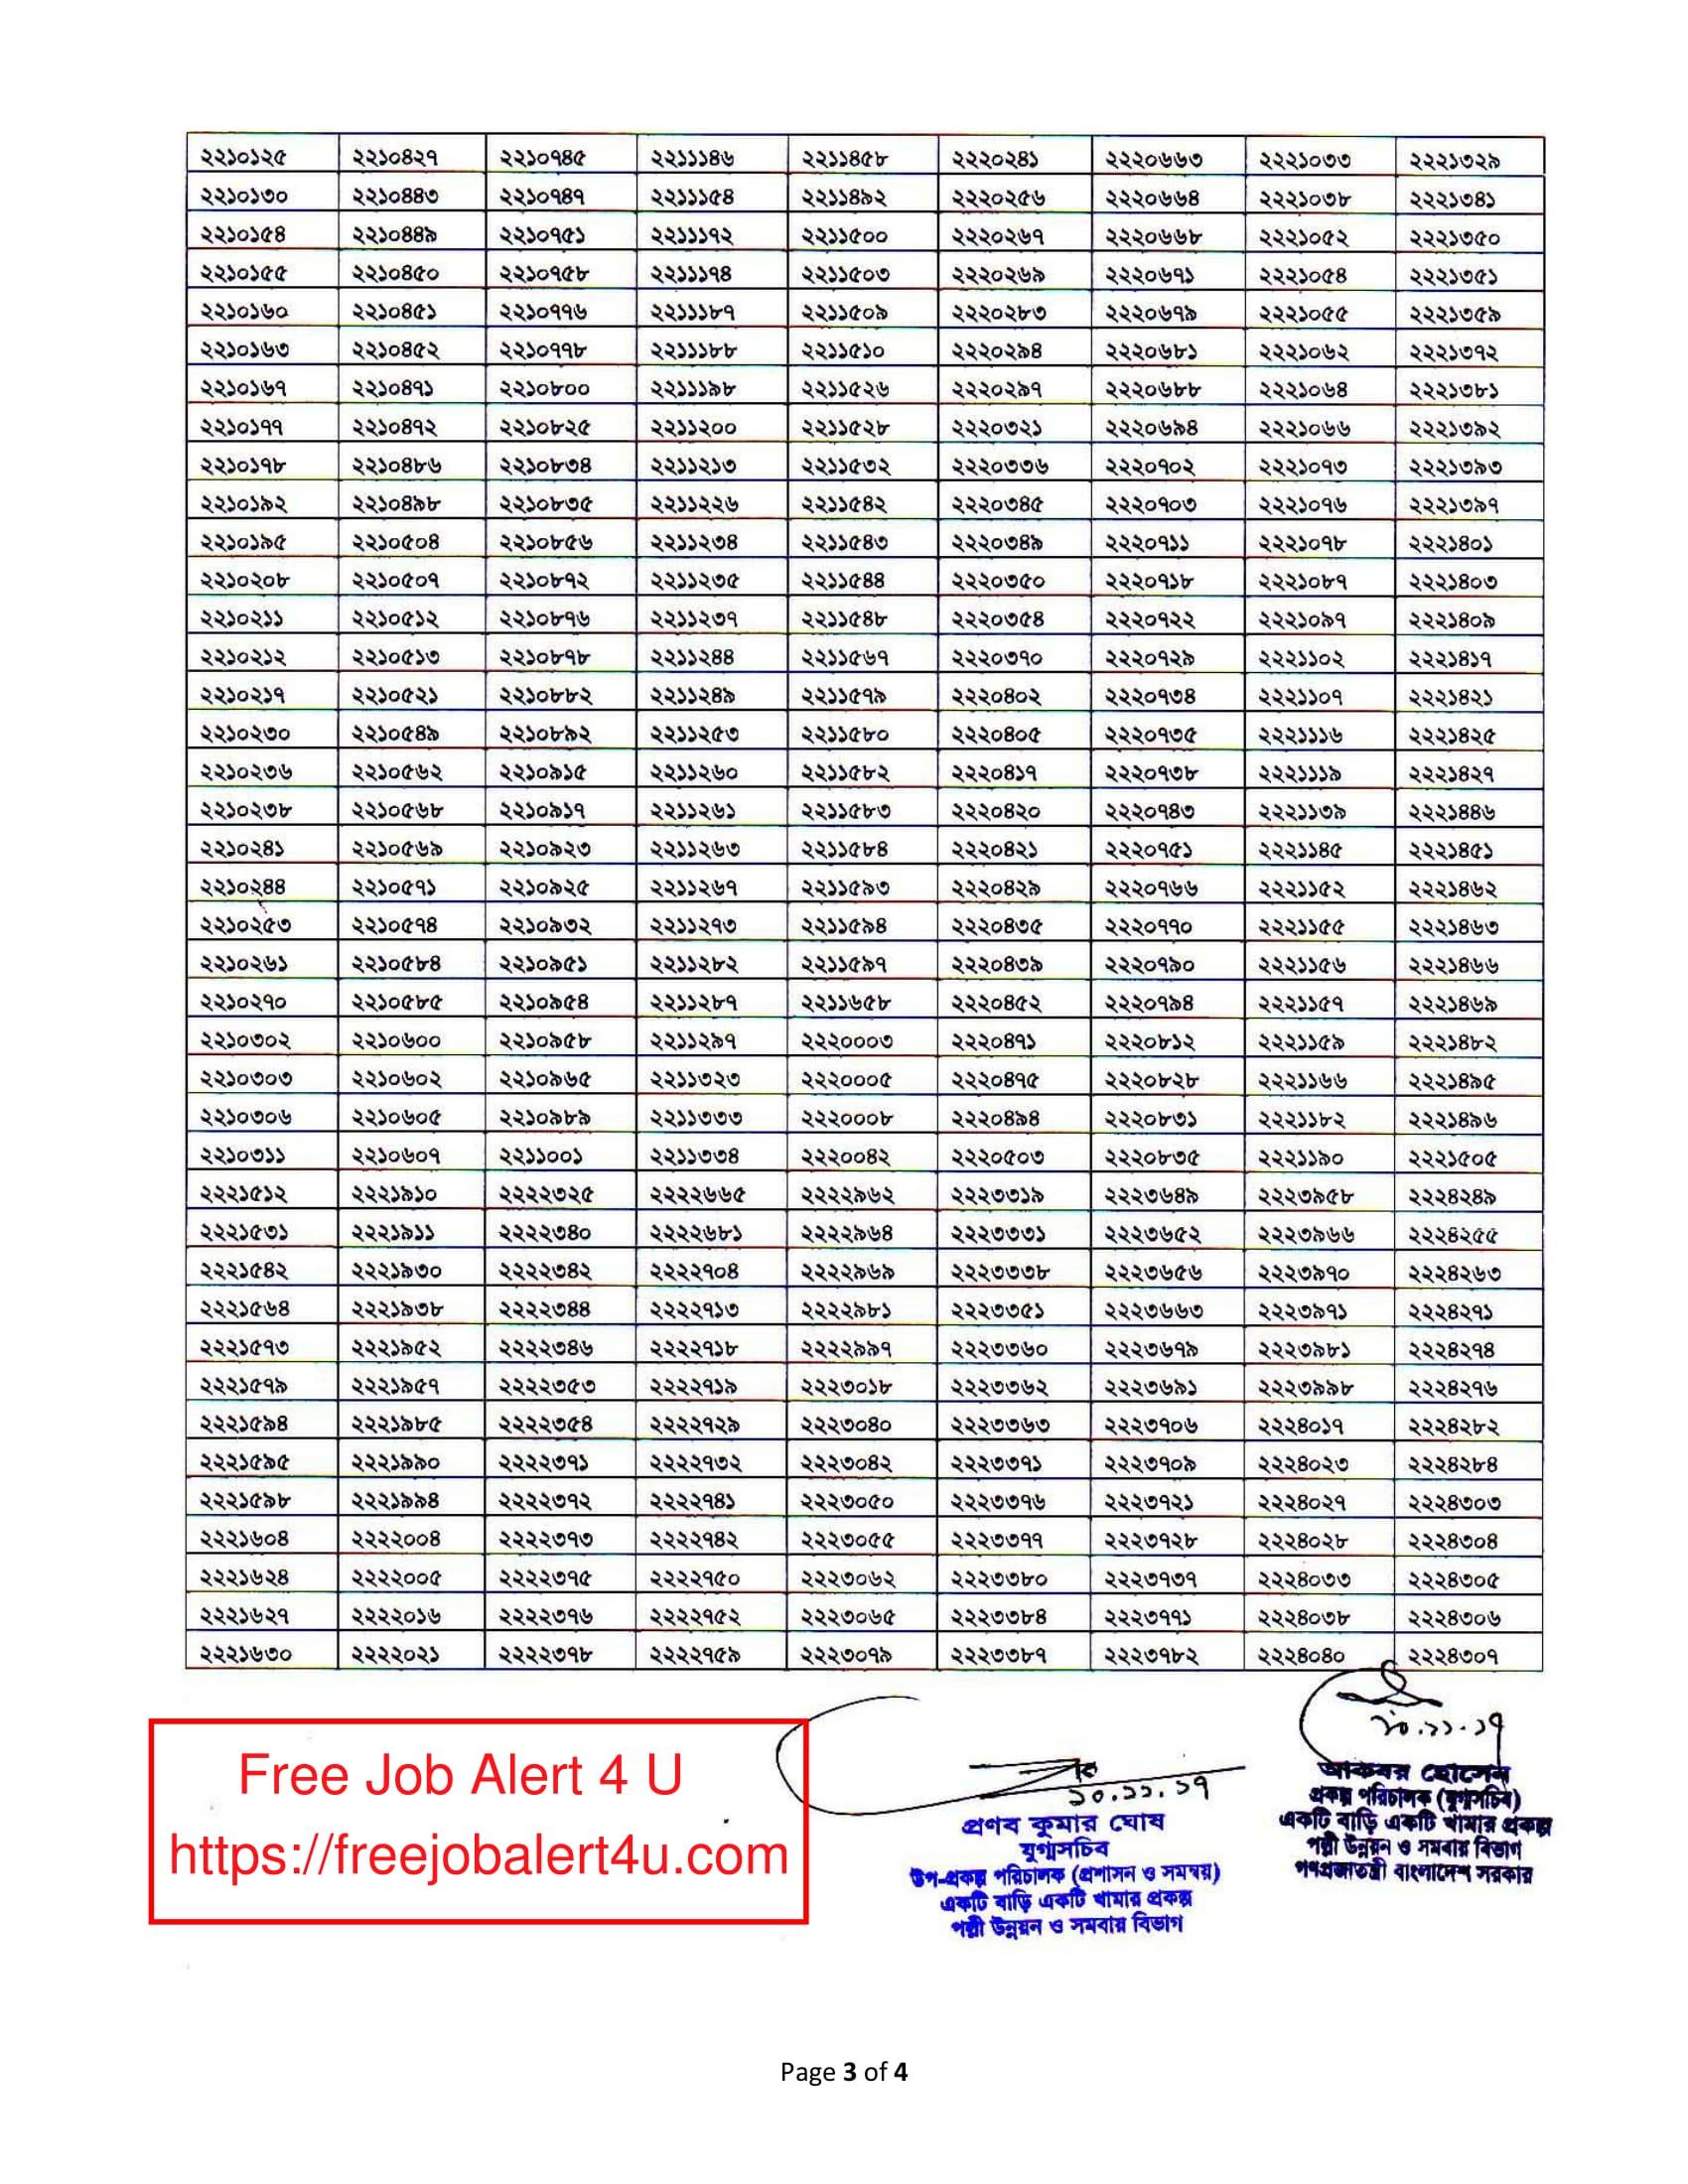 Ekti_bari_ekti_khamar_writen_exam_result_3